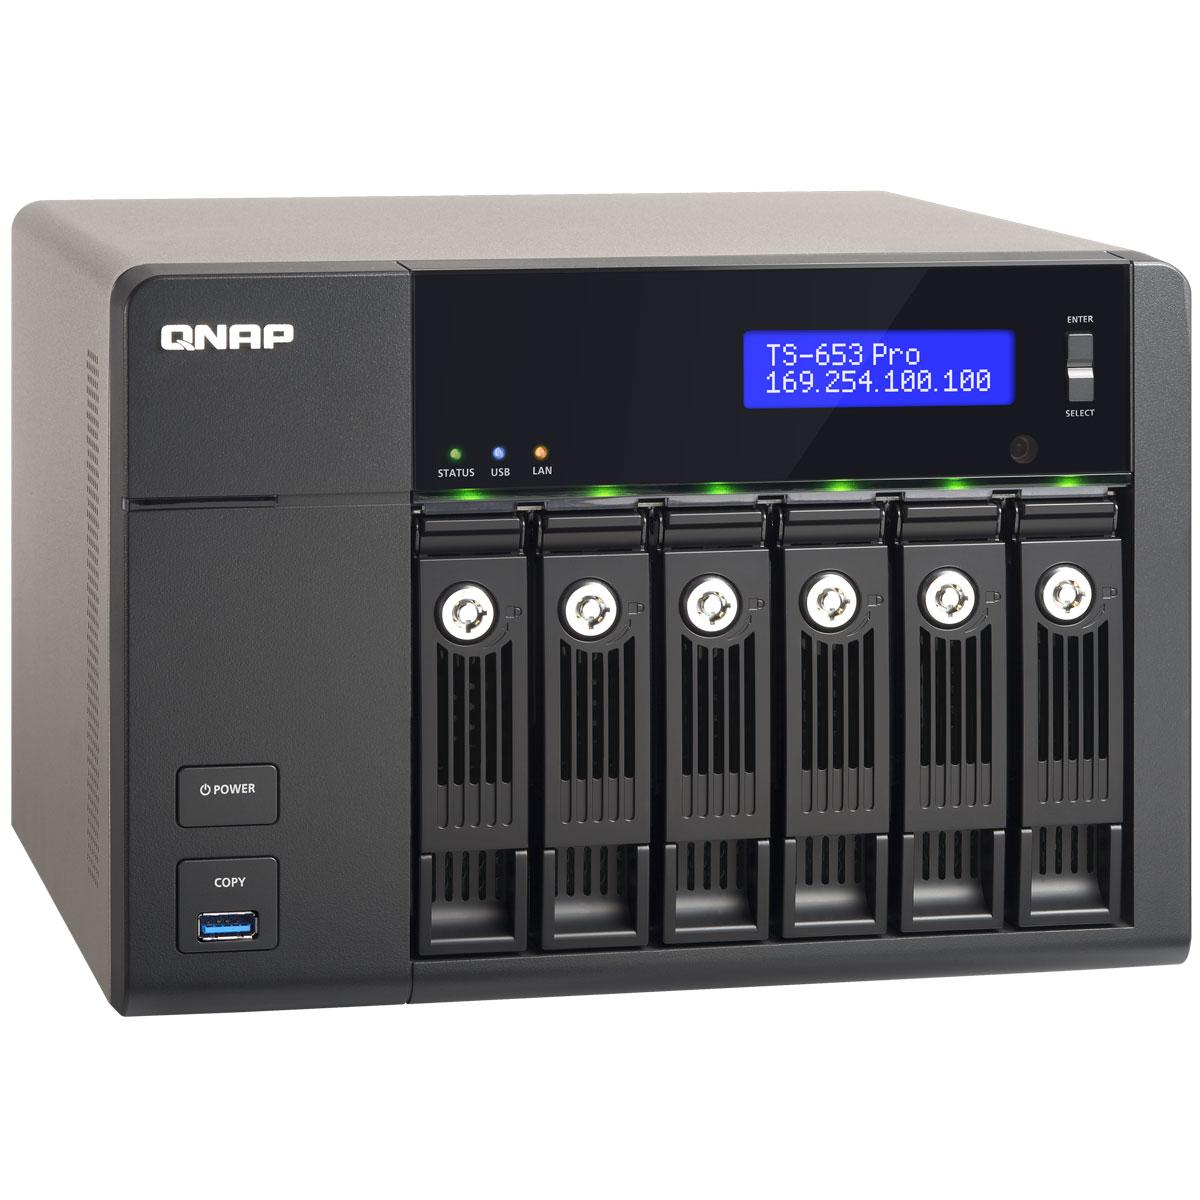 QNAP TS-653 Pro сетевой RAID-накопитель